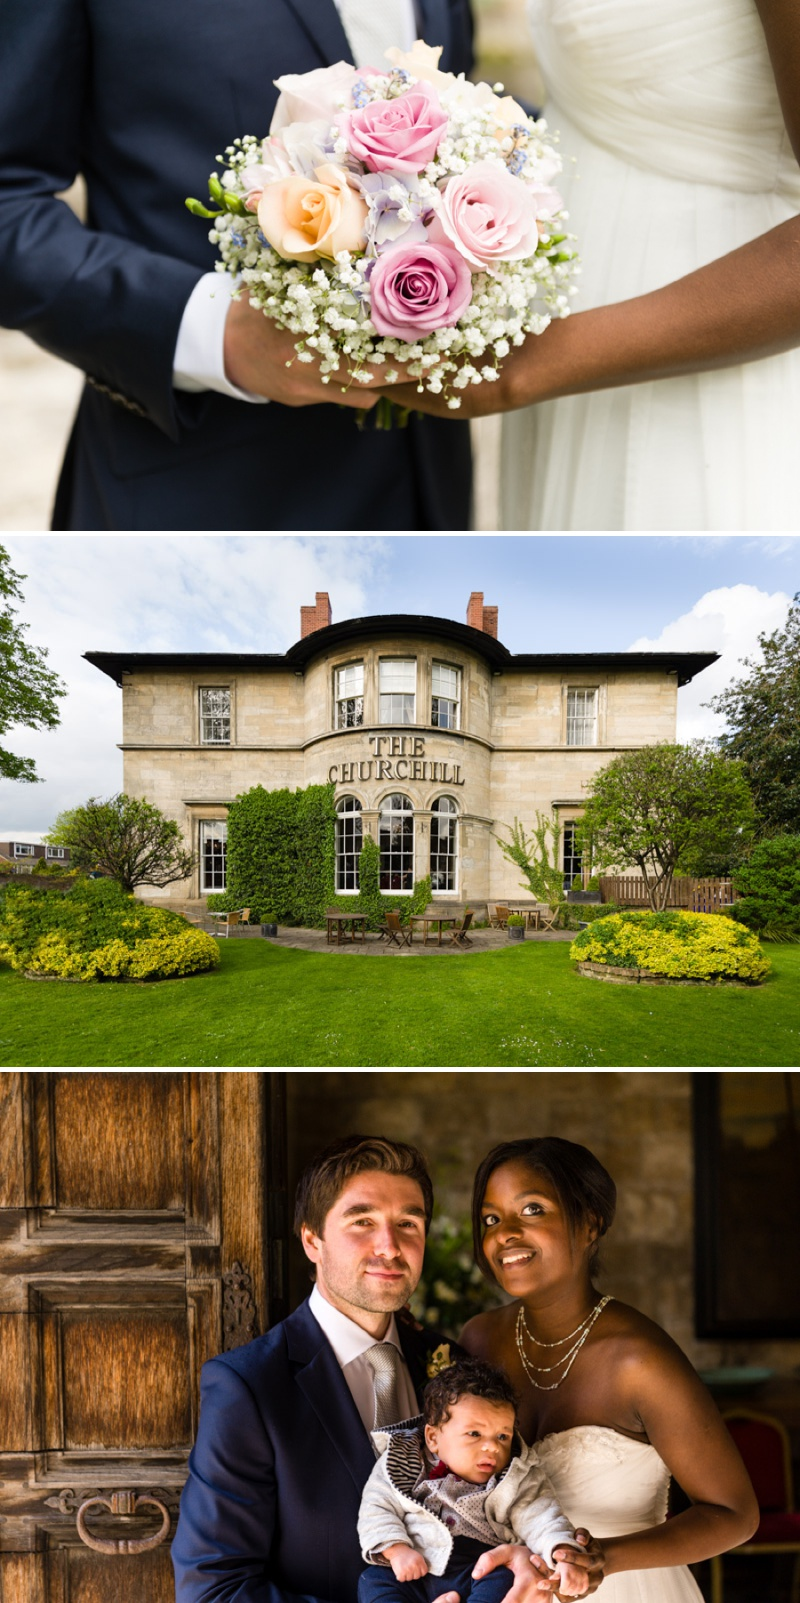 The Churchill Hotel Wedding Venue York